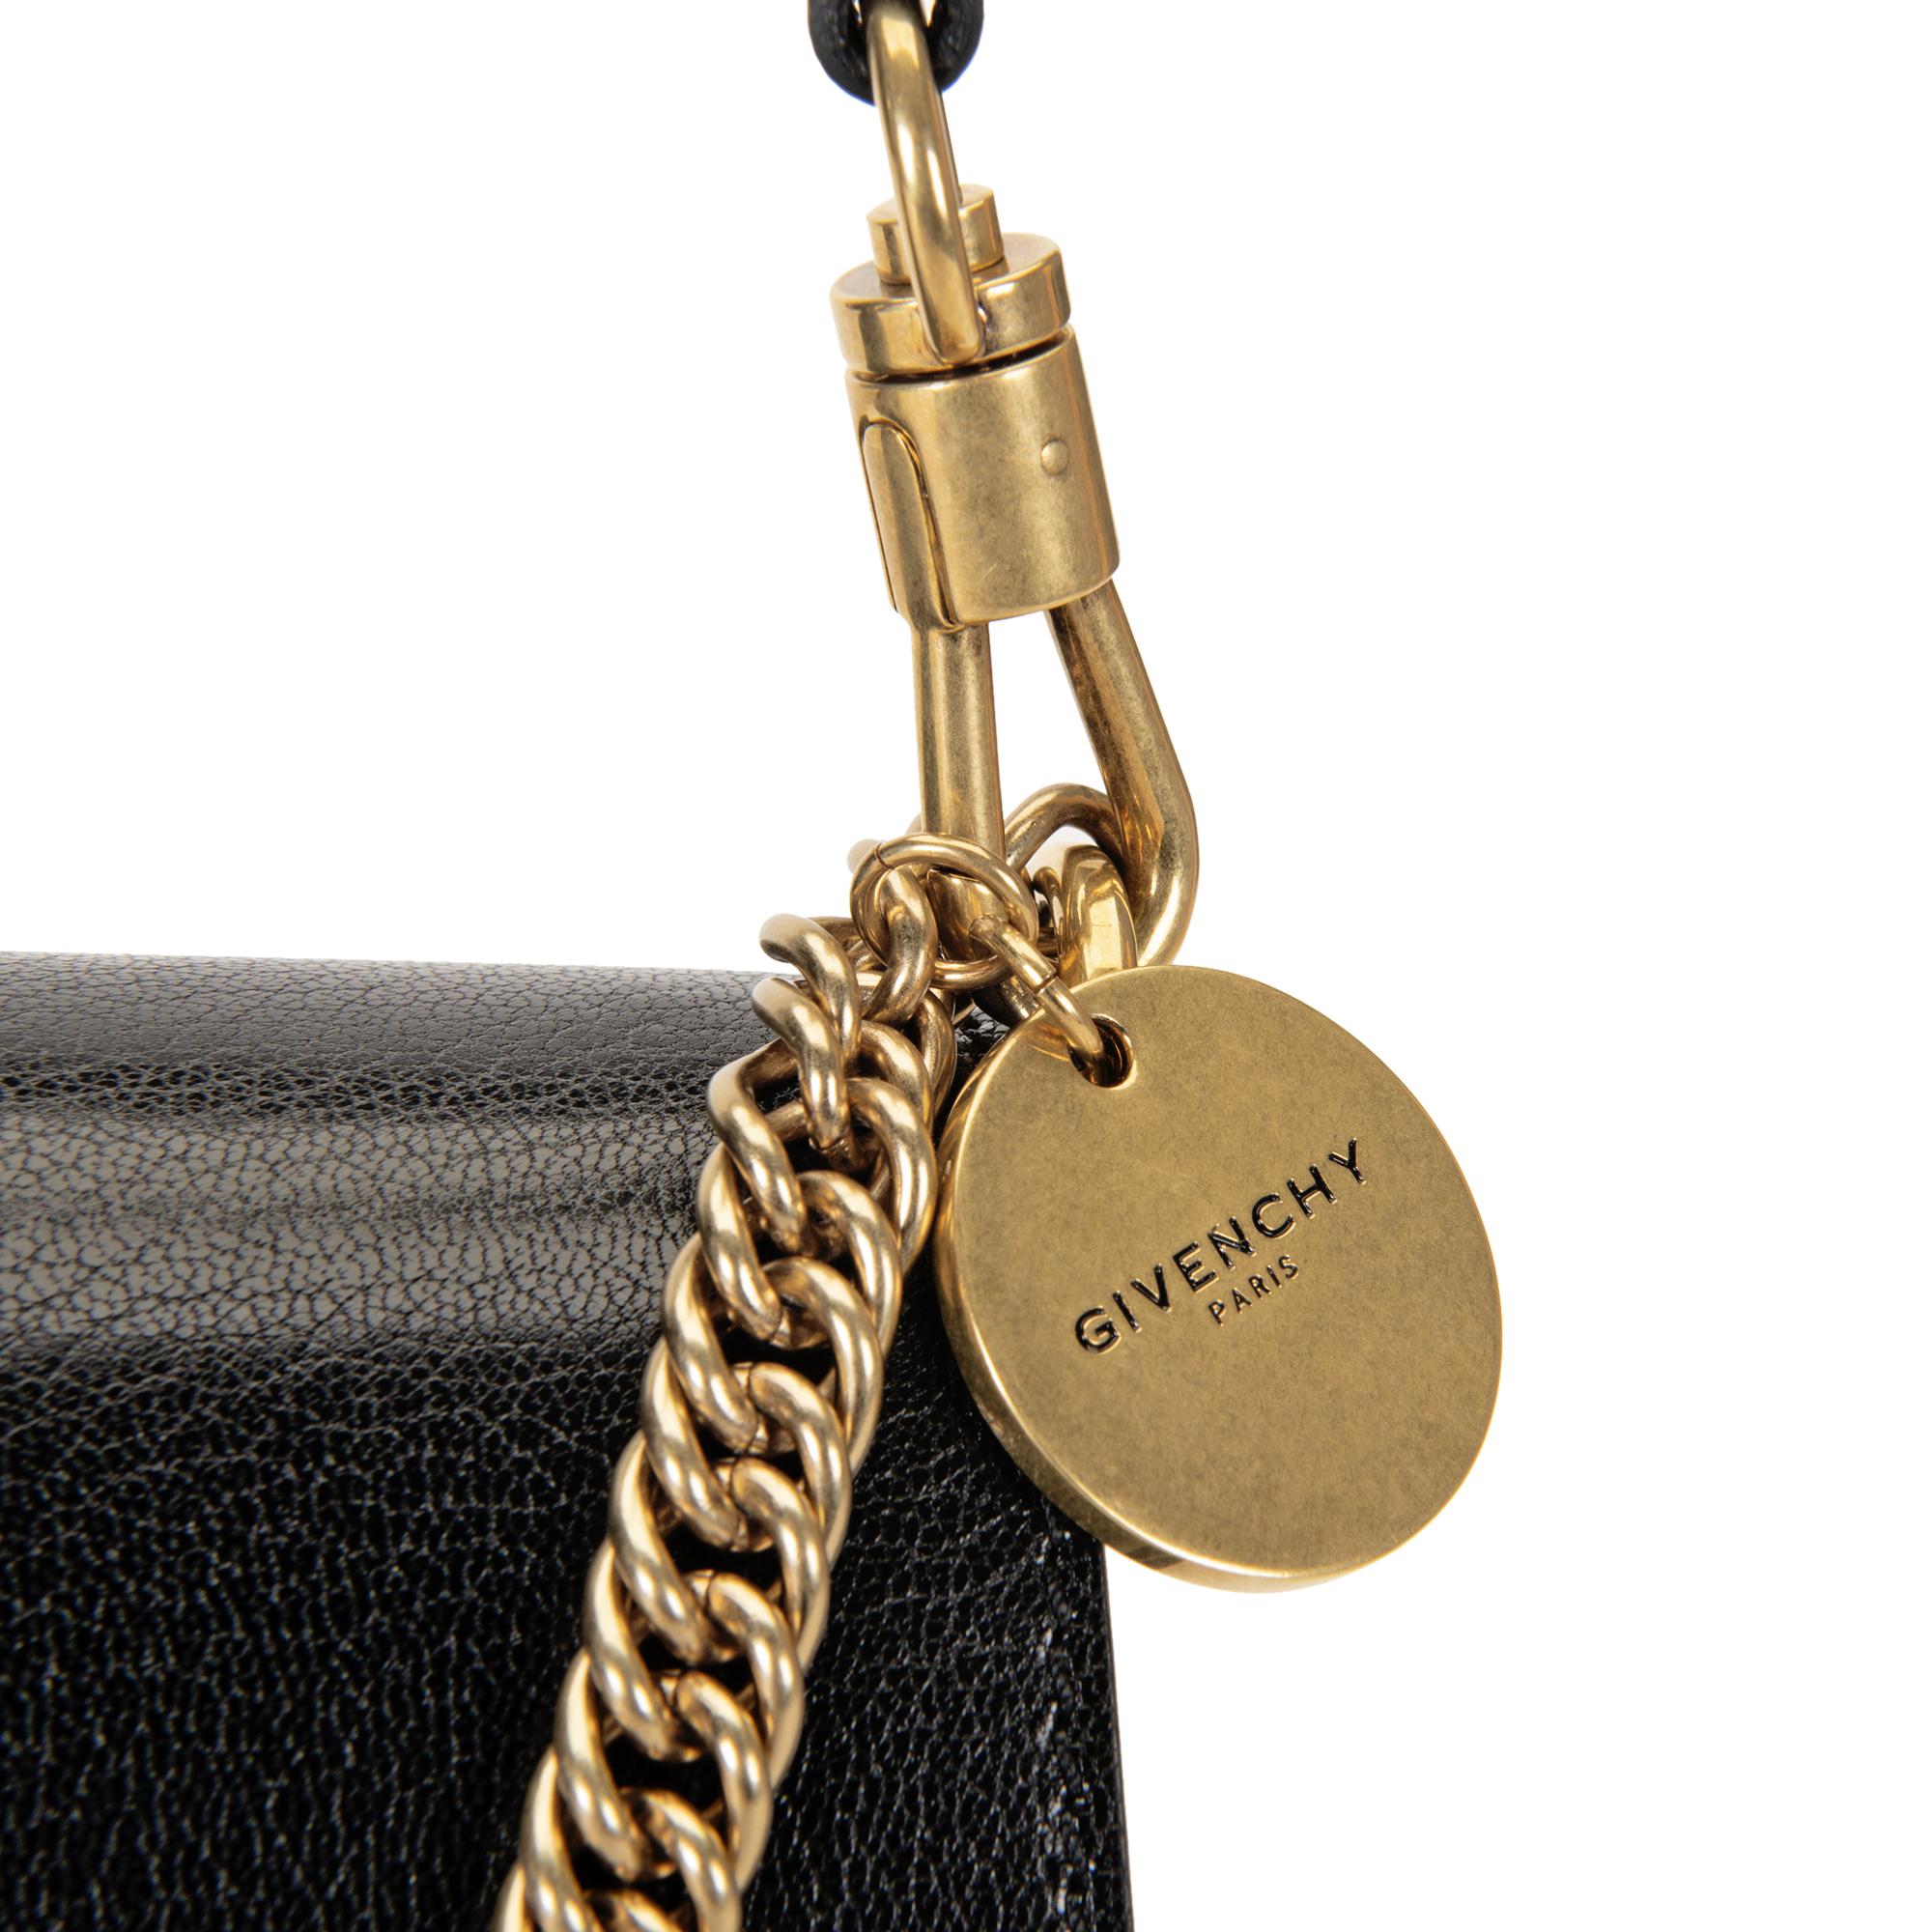 1522841-10 Givenchy